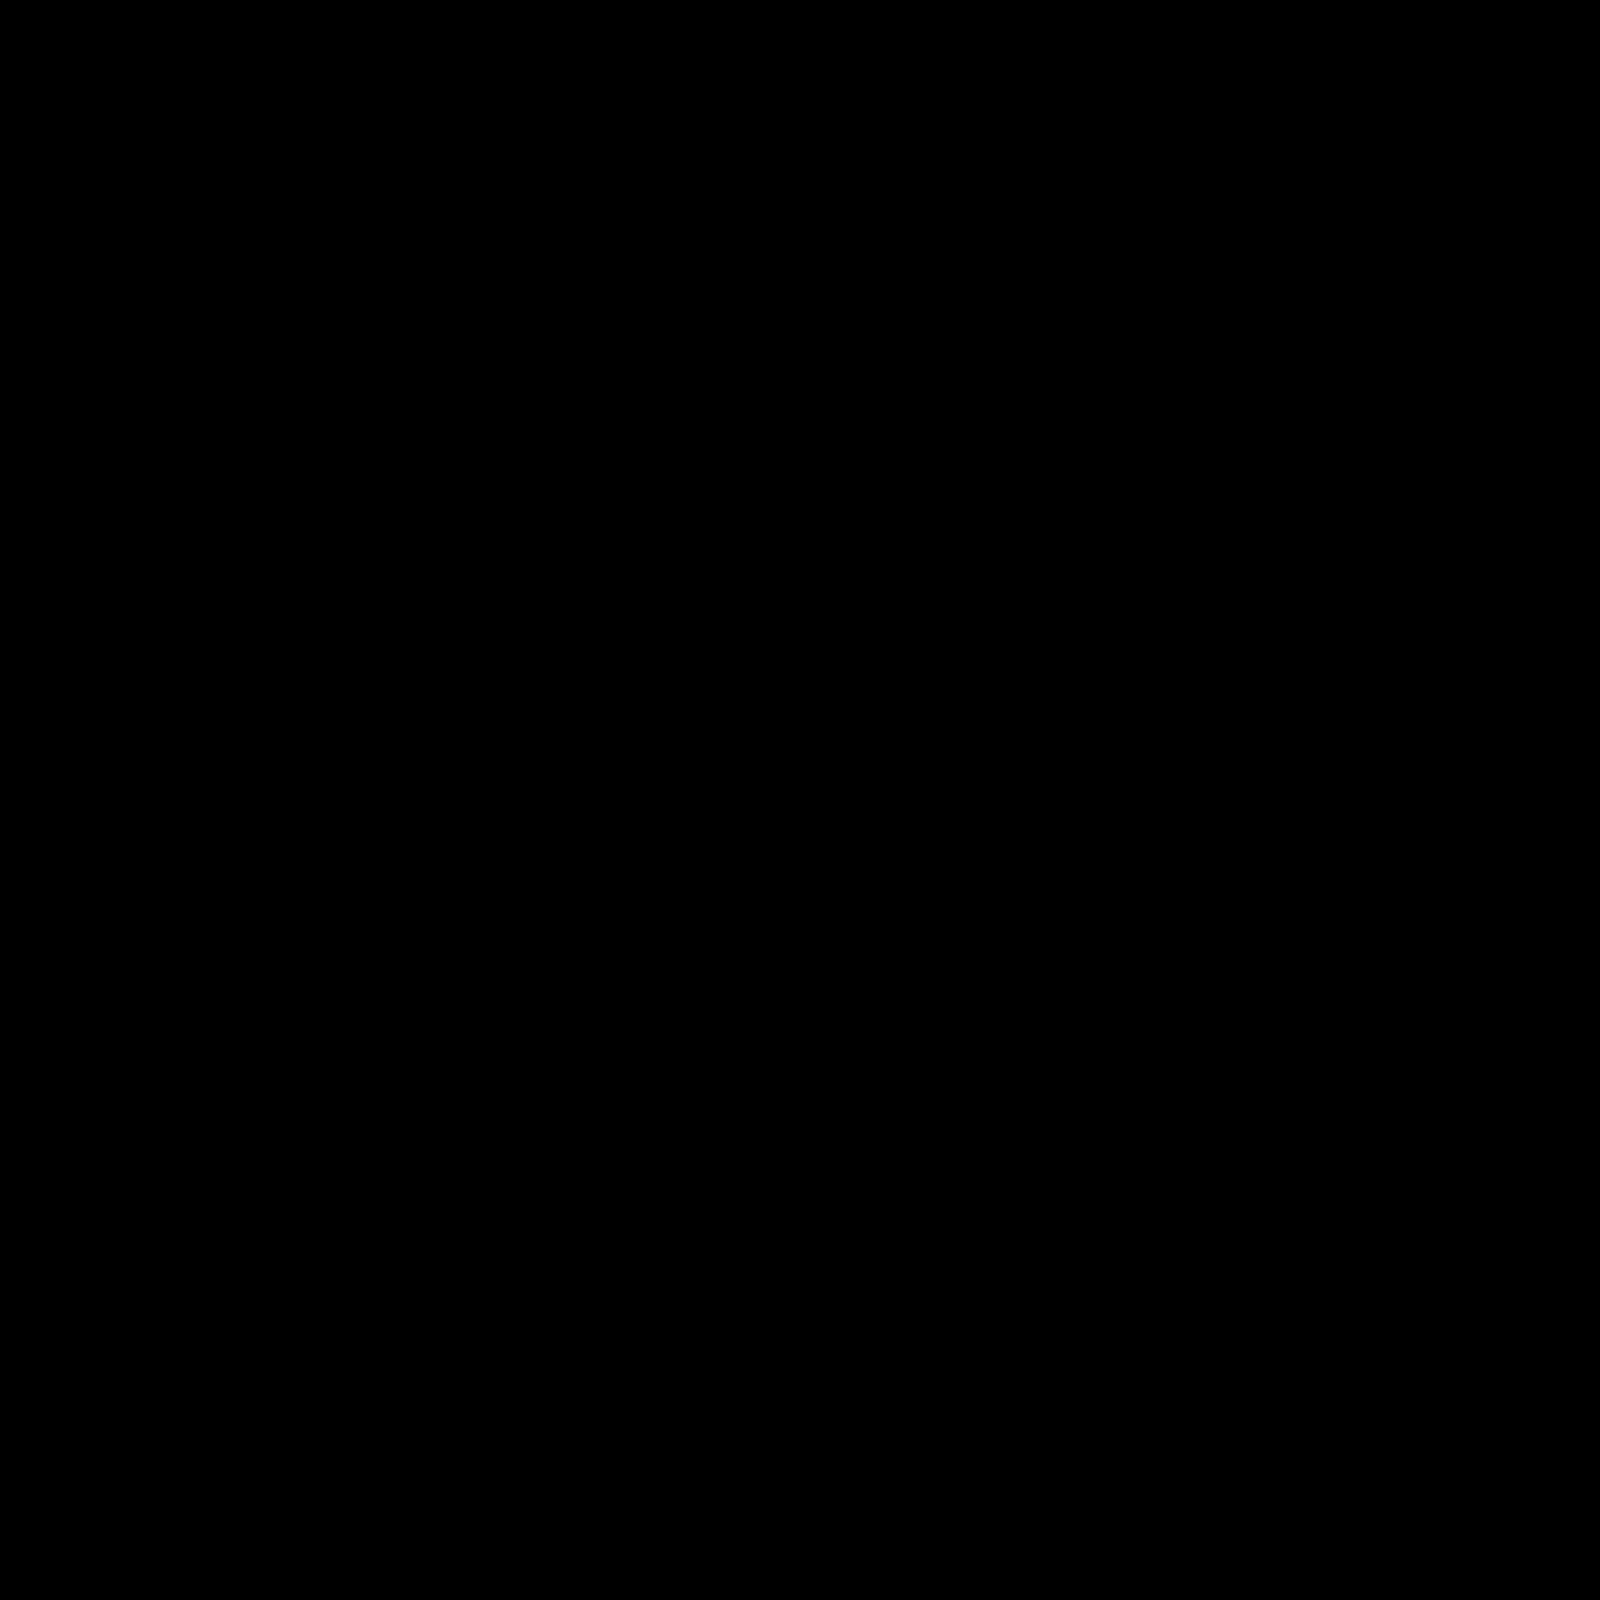 Welding clipart transparent. Manual metal arc icon